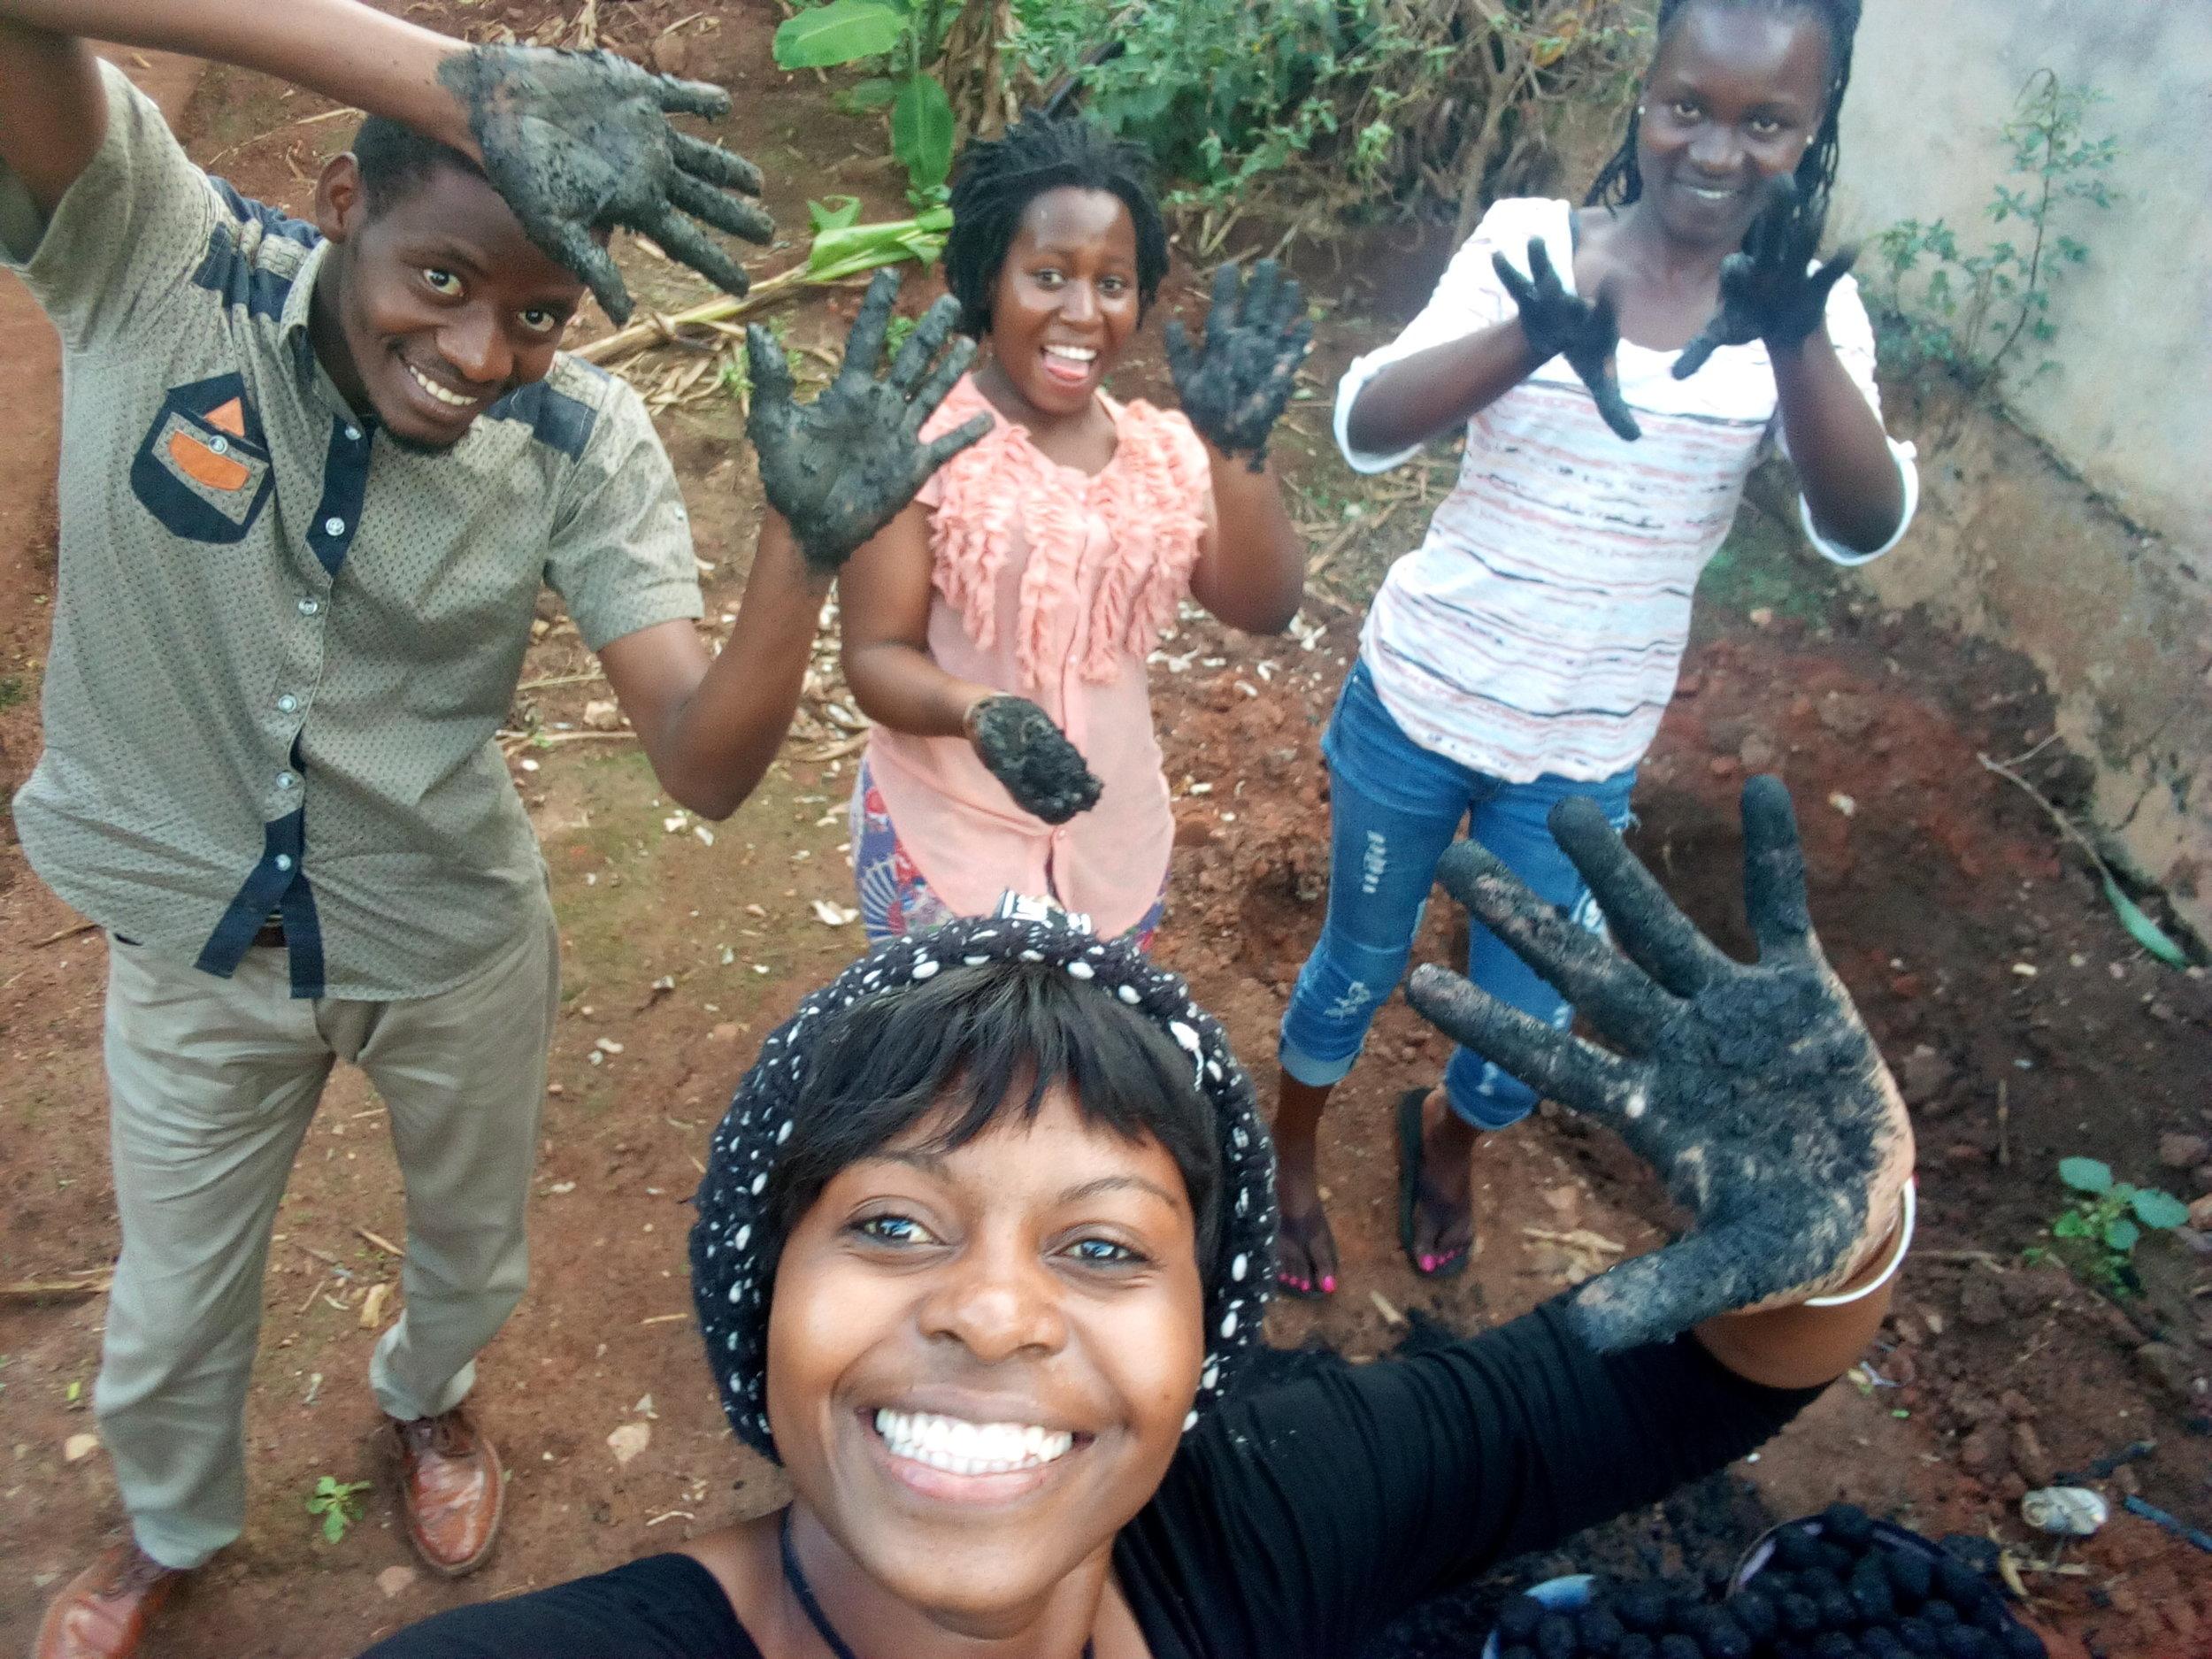 Millennium Fellows '18 at Makerere University, Uganda